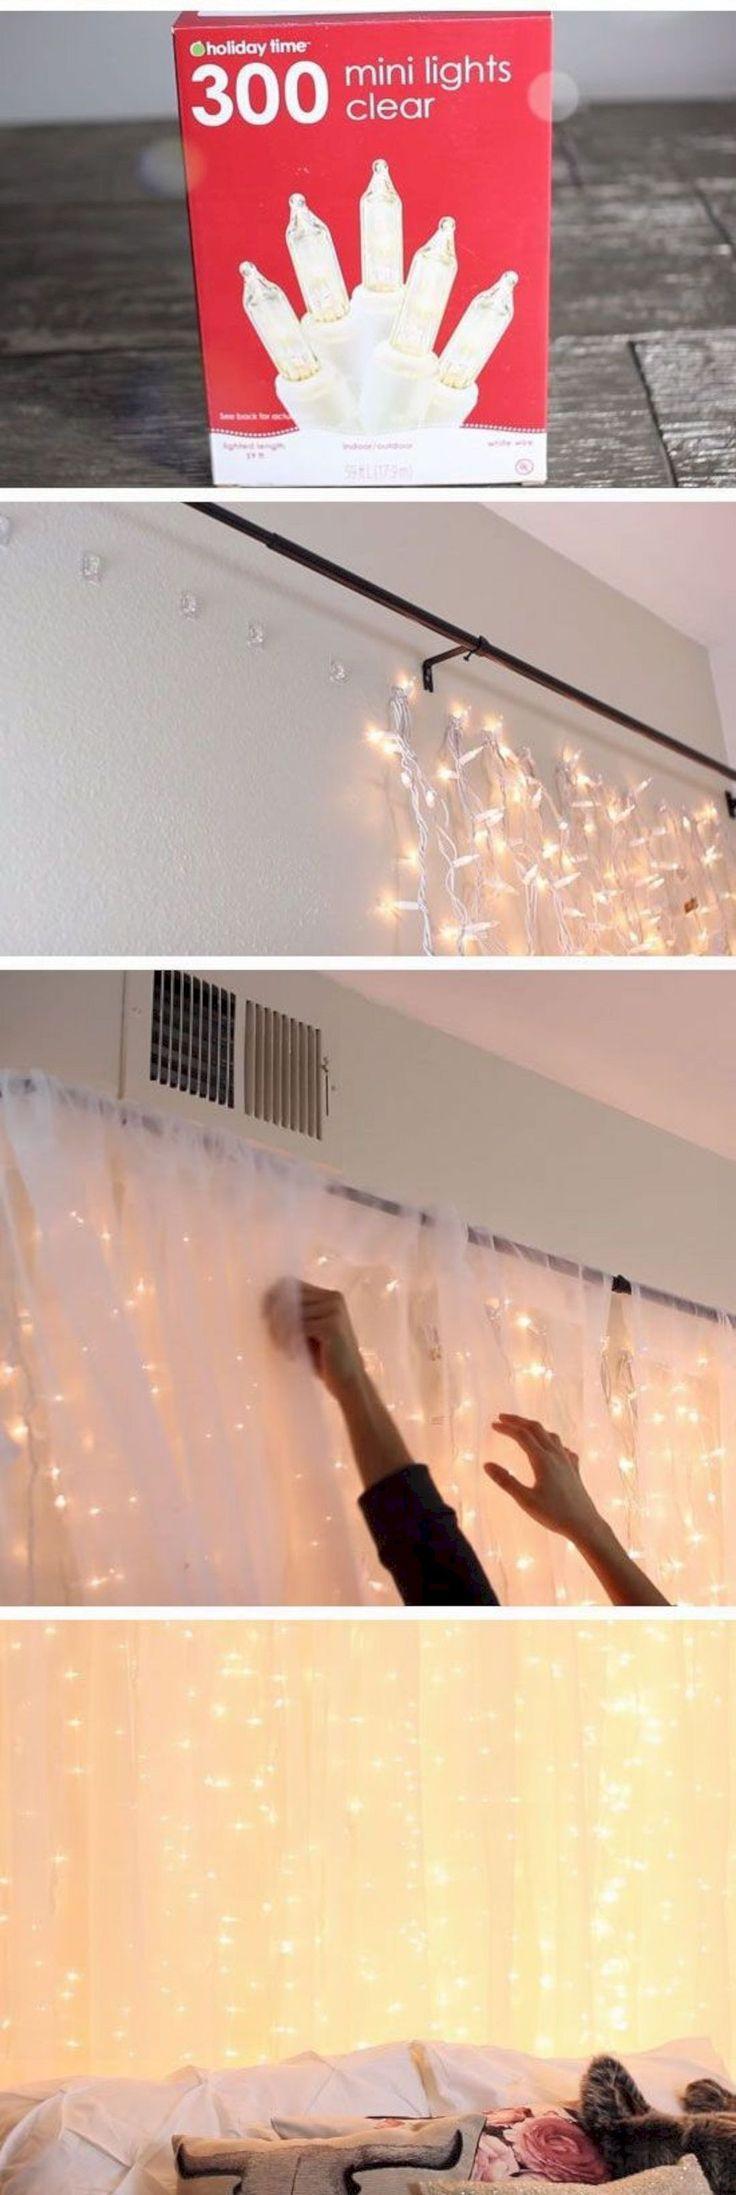 17 Top DIY Home Decor for Small Apartments https://www.futuristarchitecture.com/28217-diy-home-decor-small-apartments.html #cheaphomedesign #DIY*HomeDecorating*Ideas